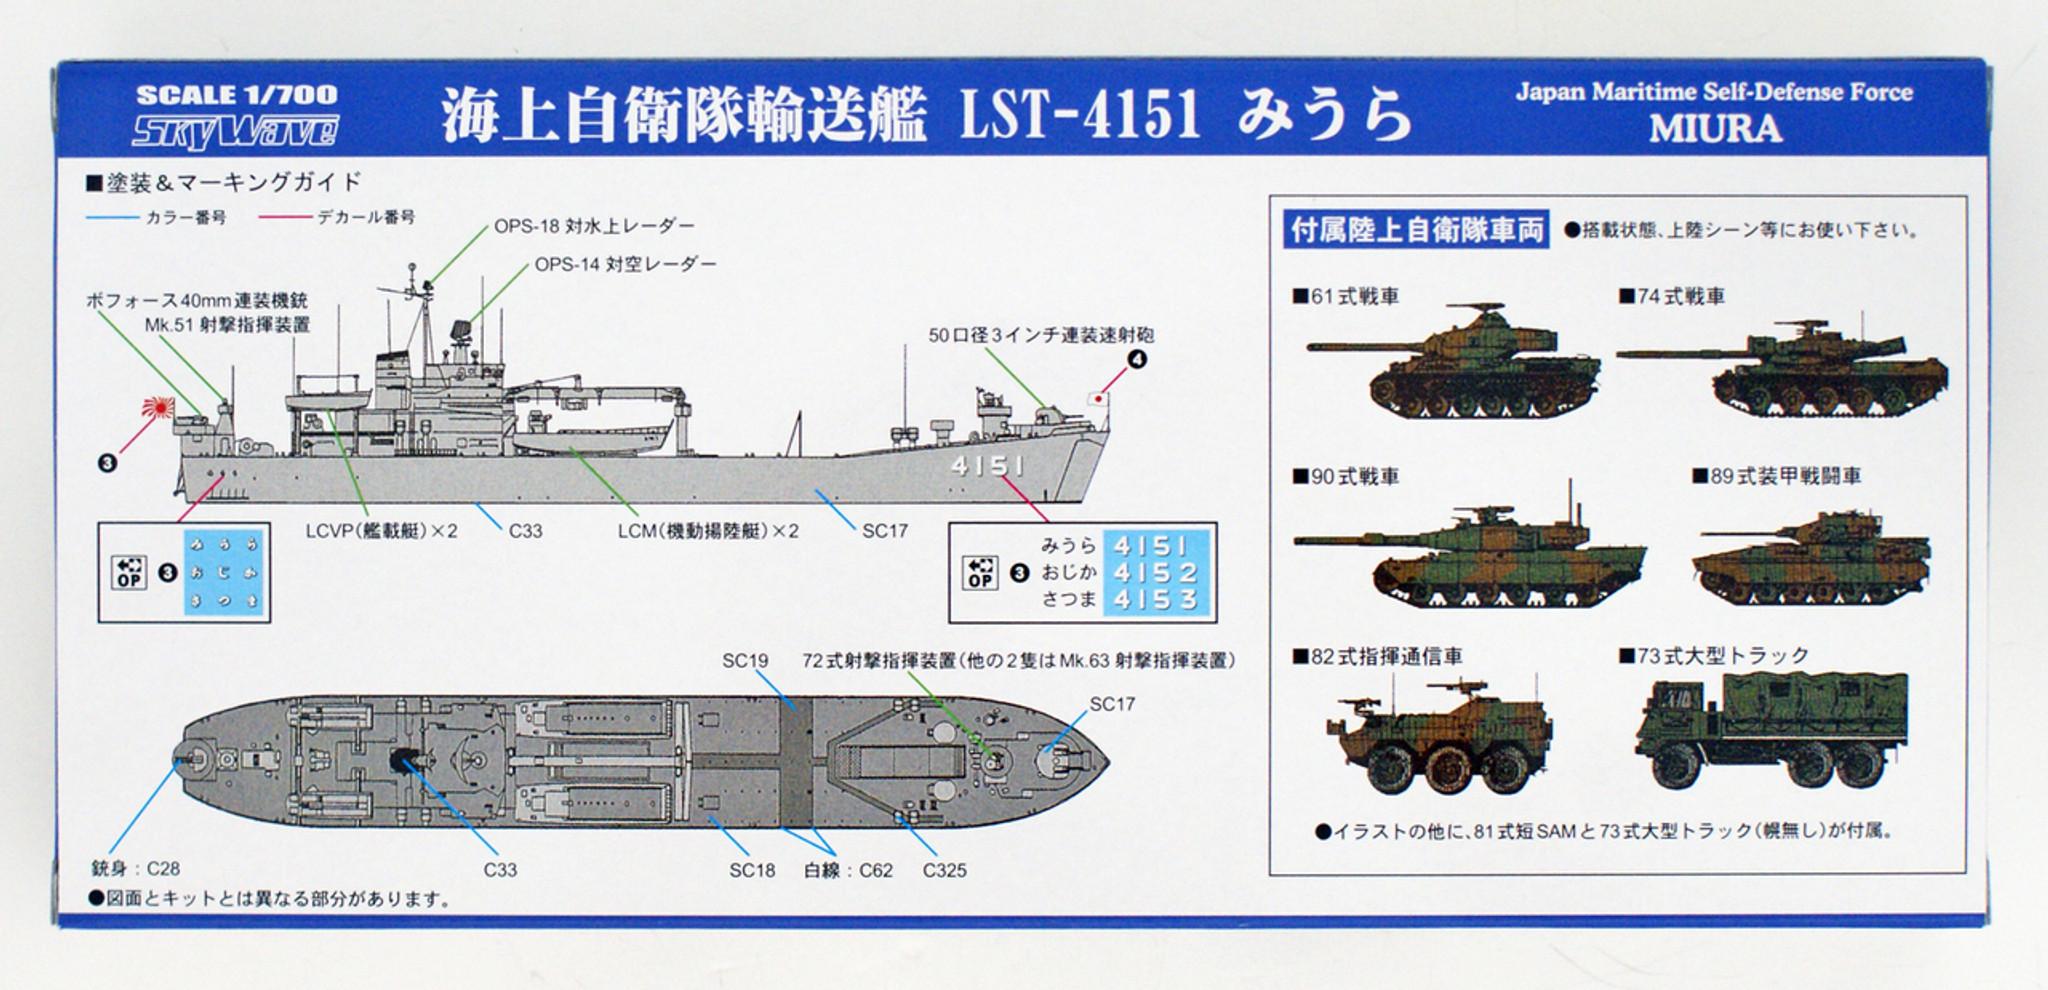 Pit-Road Skywave J-83 JMSDF Tank Landing Ship LST-4151 Miura 1//700 scale kit